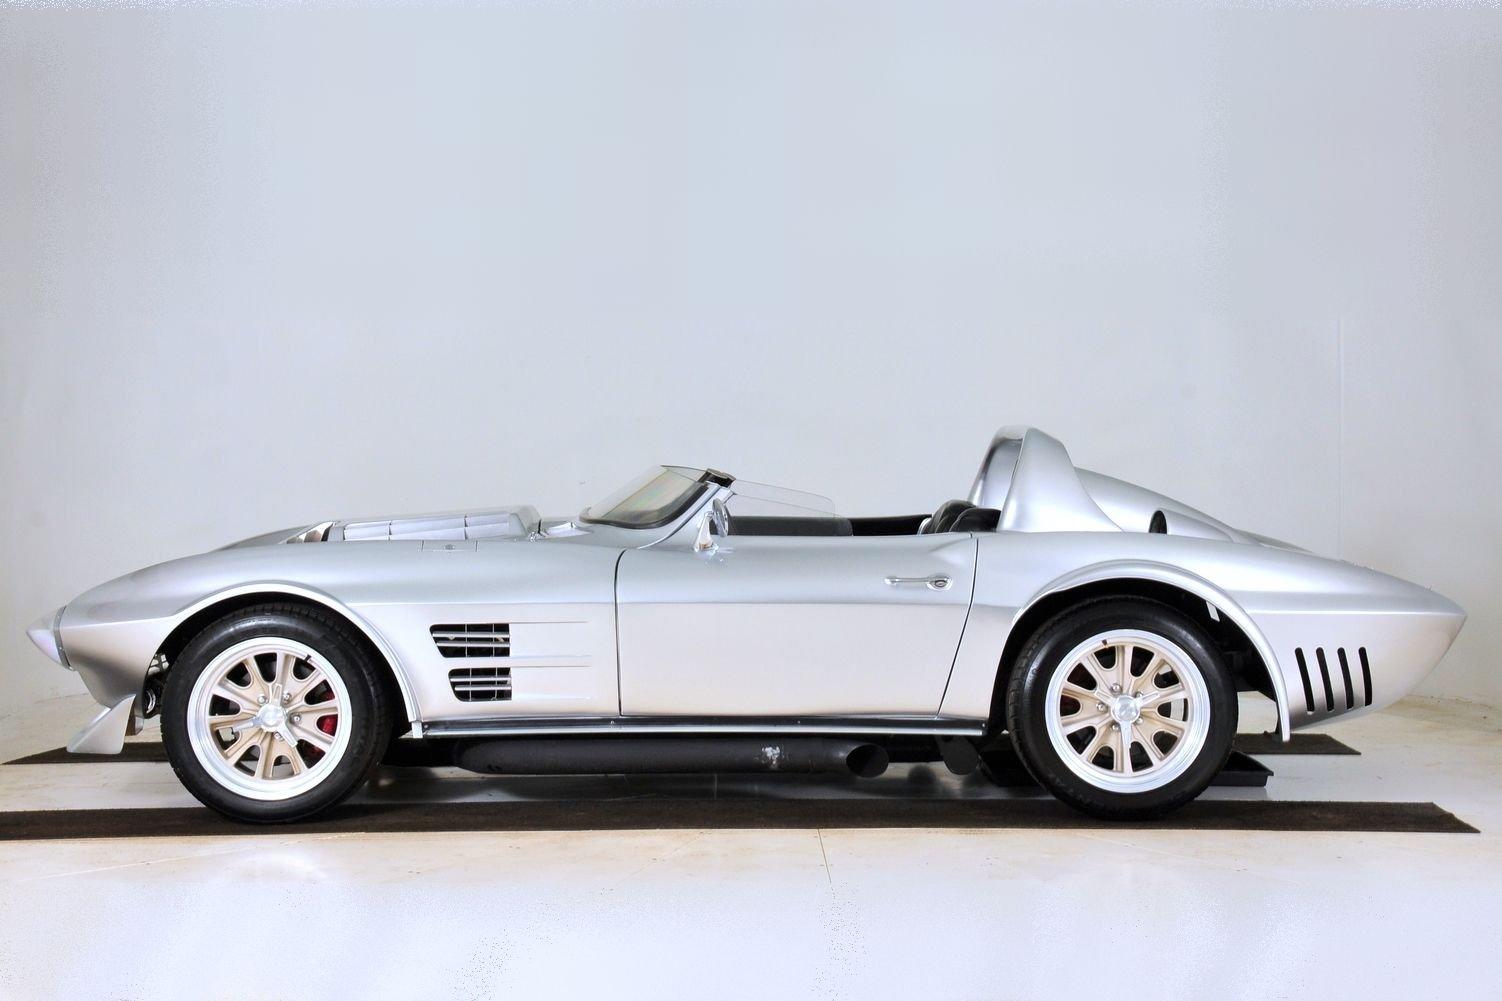 1963 Chevrolet Corvette Mongoose Motorsports Grand Sport Fast Five profile